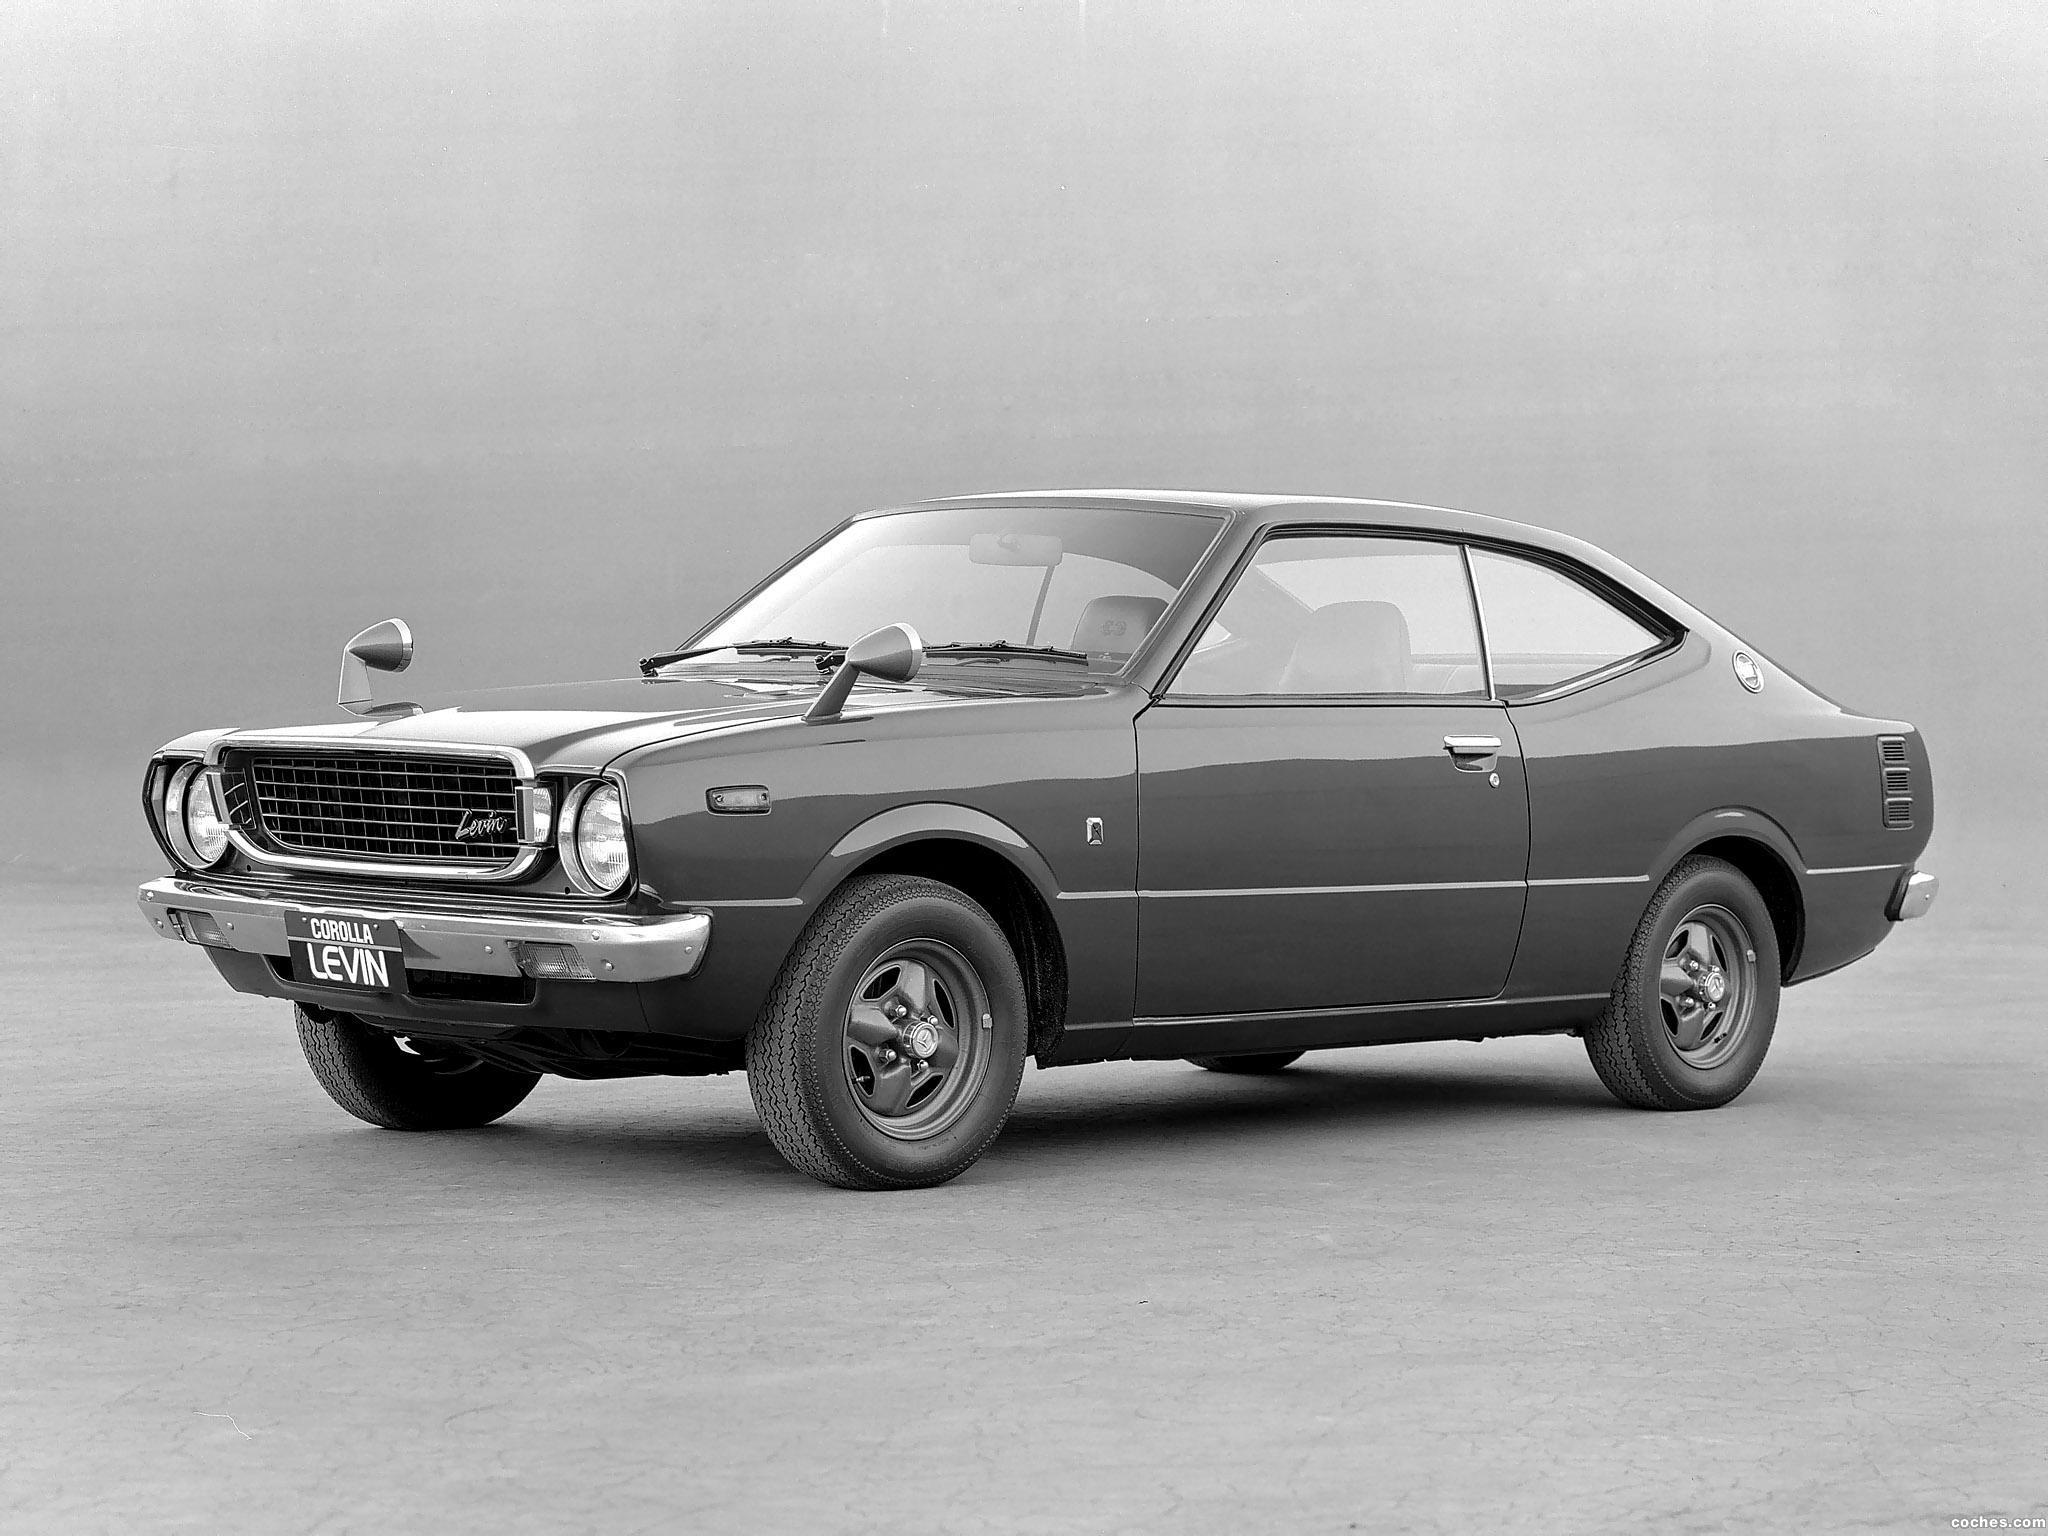 Fotos De Toyota Corolla Levin Te37 1974